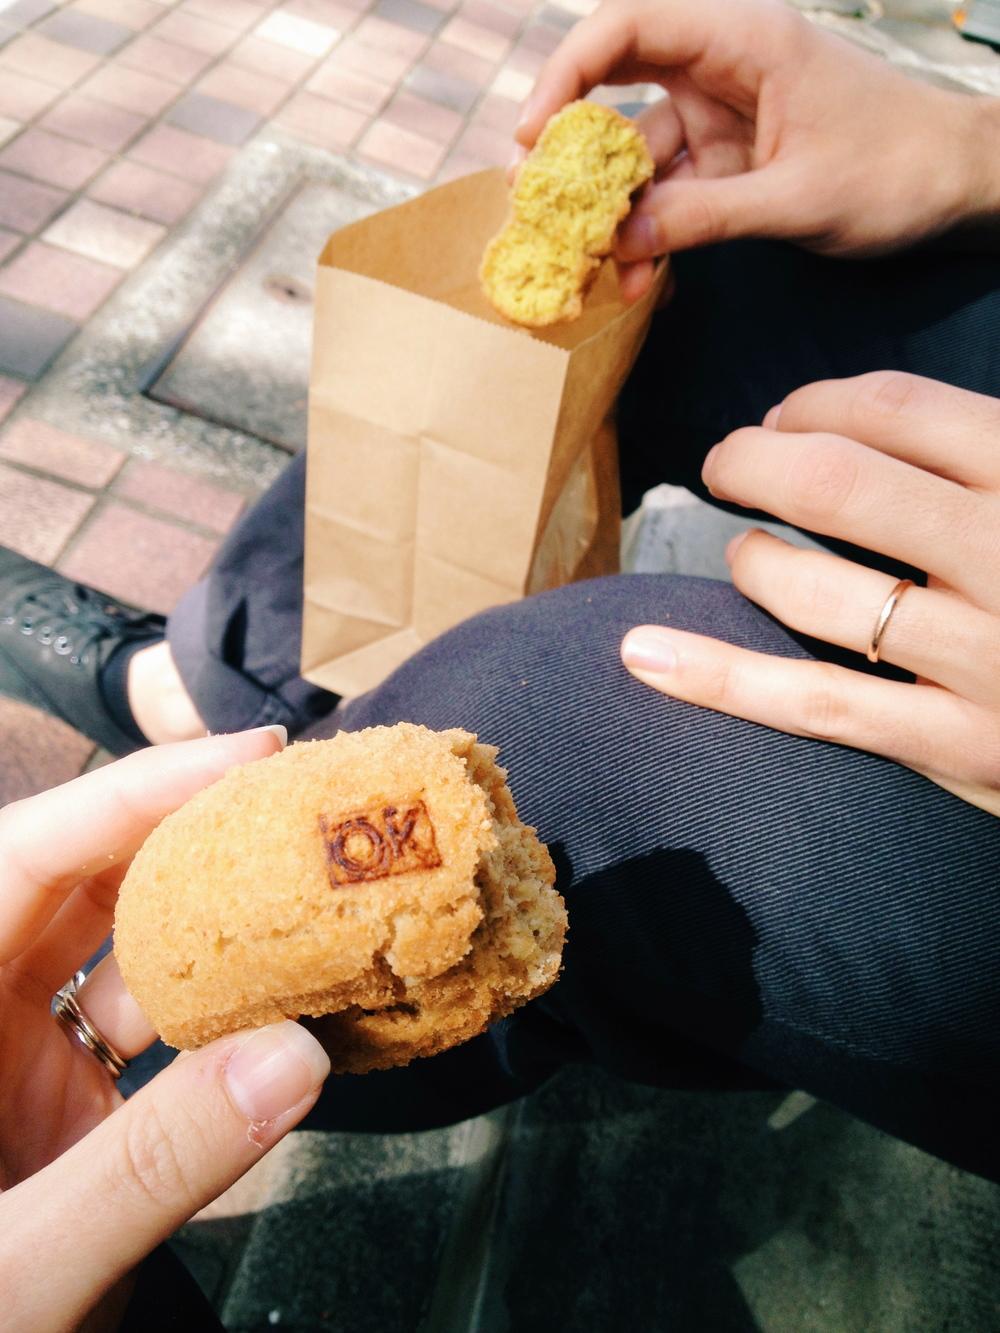 Tasty doughnuts in Meguro